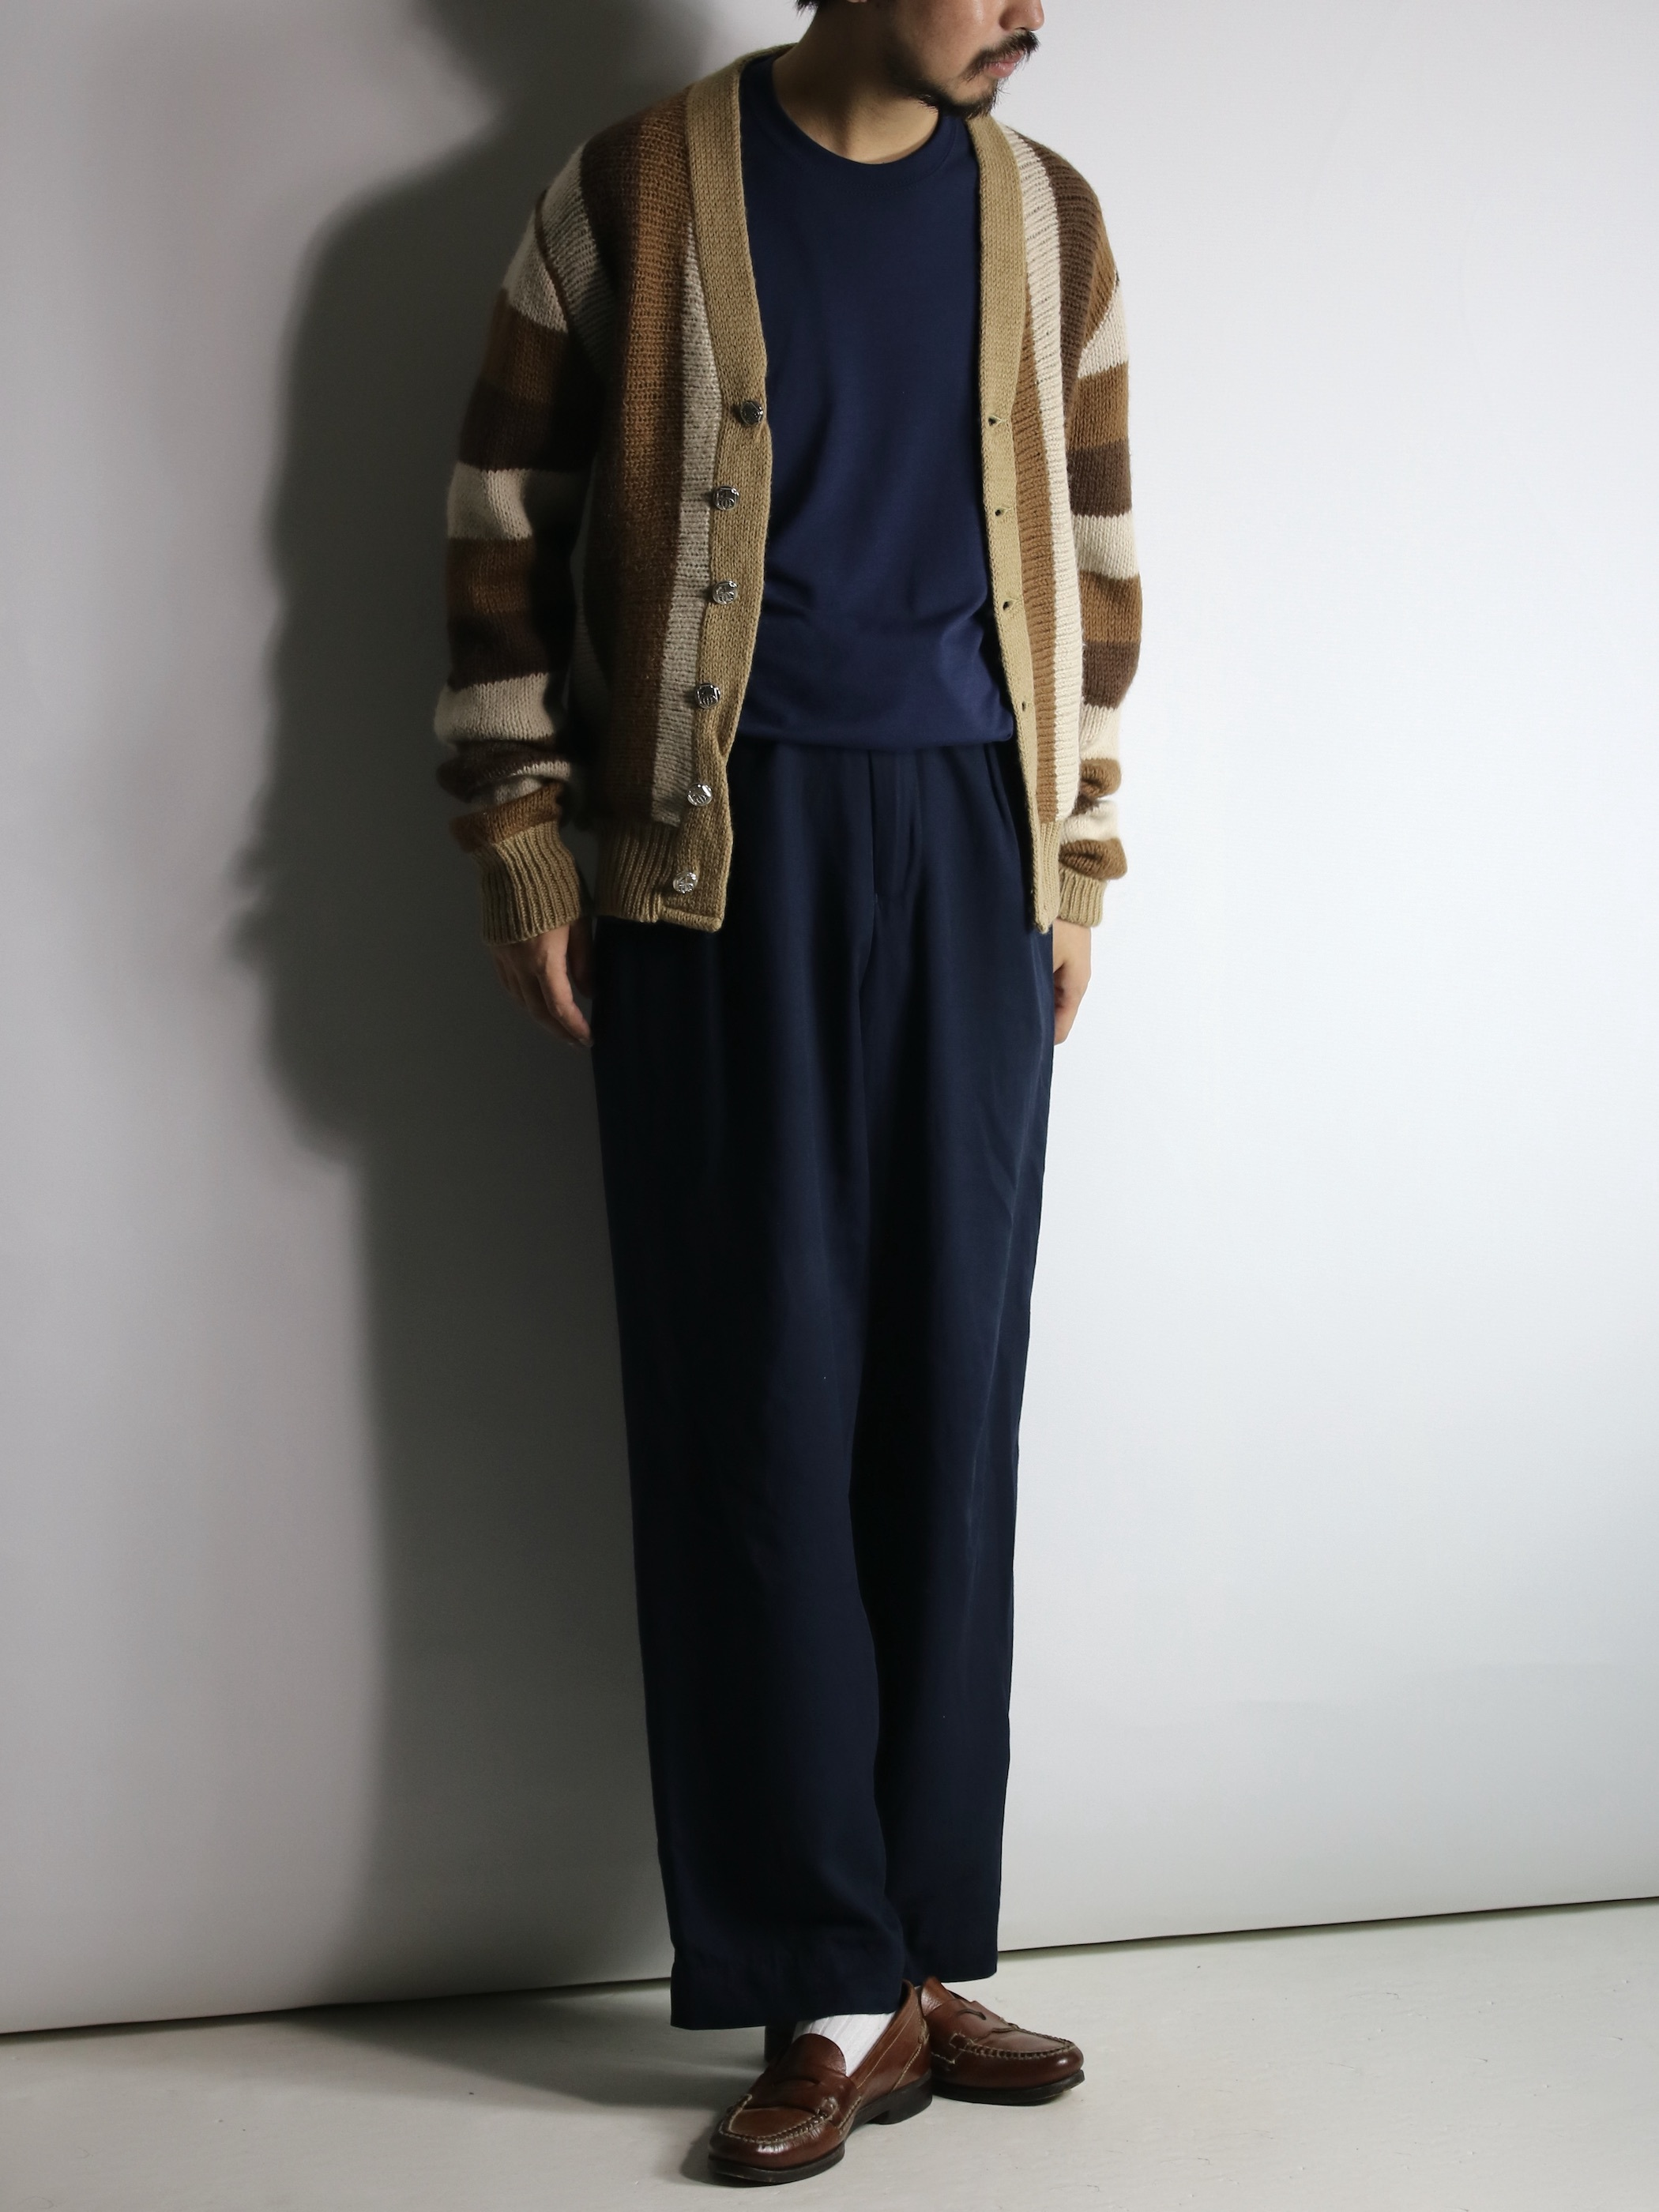 1960-1980's Vintage Knit Cardigan